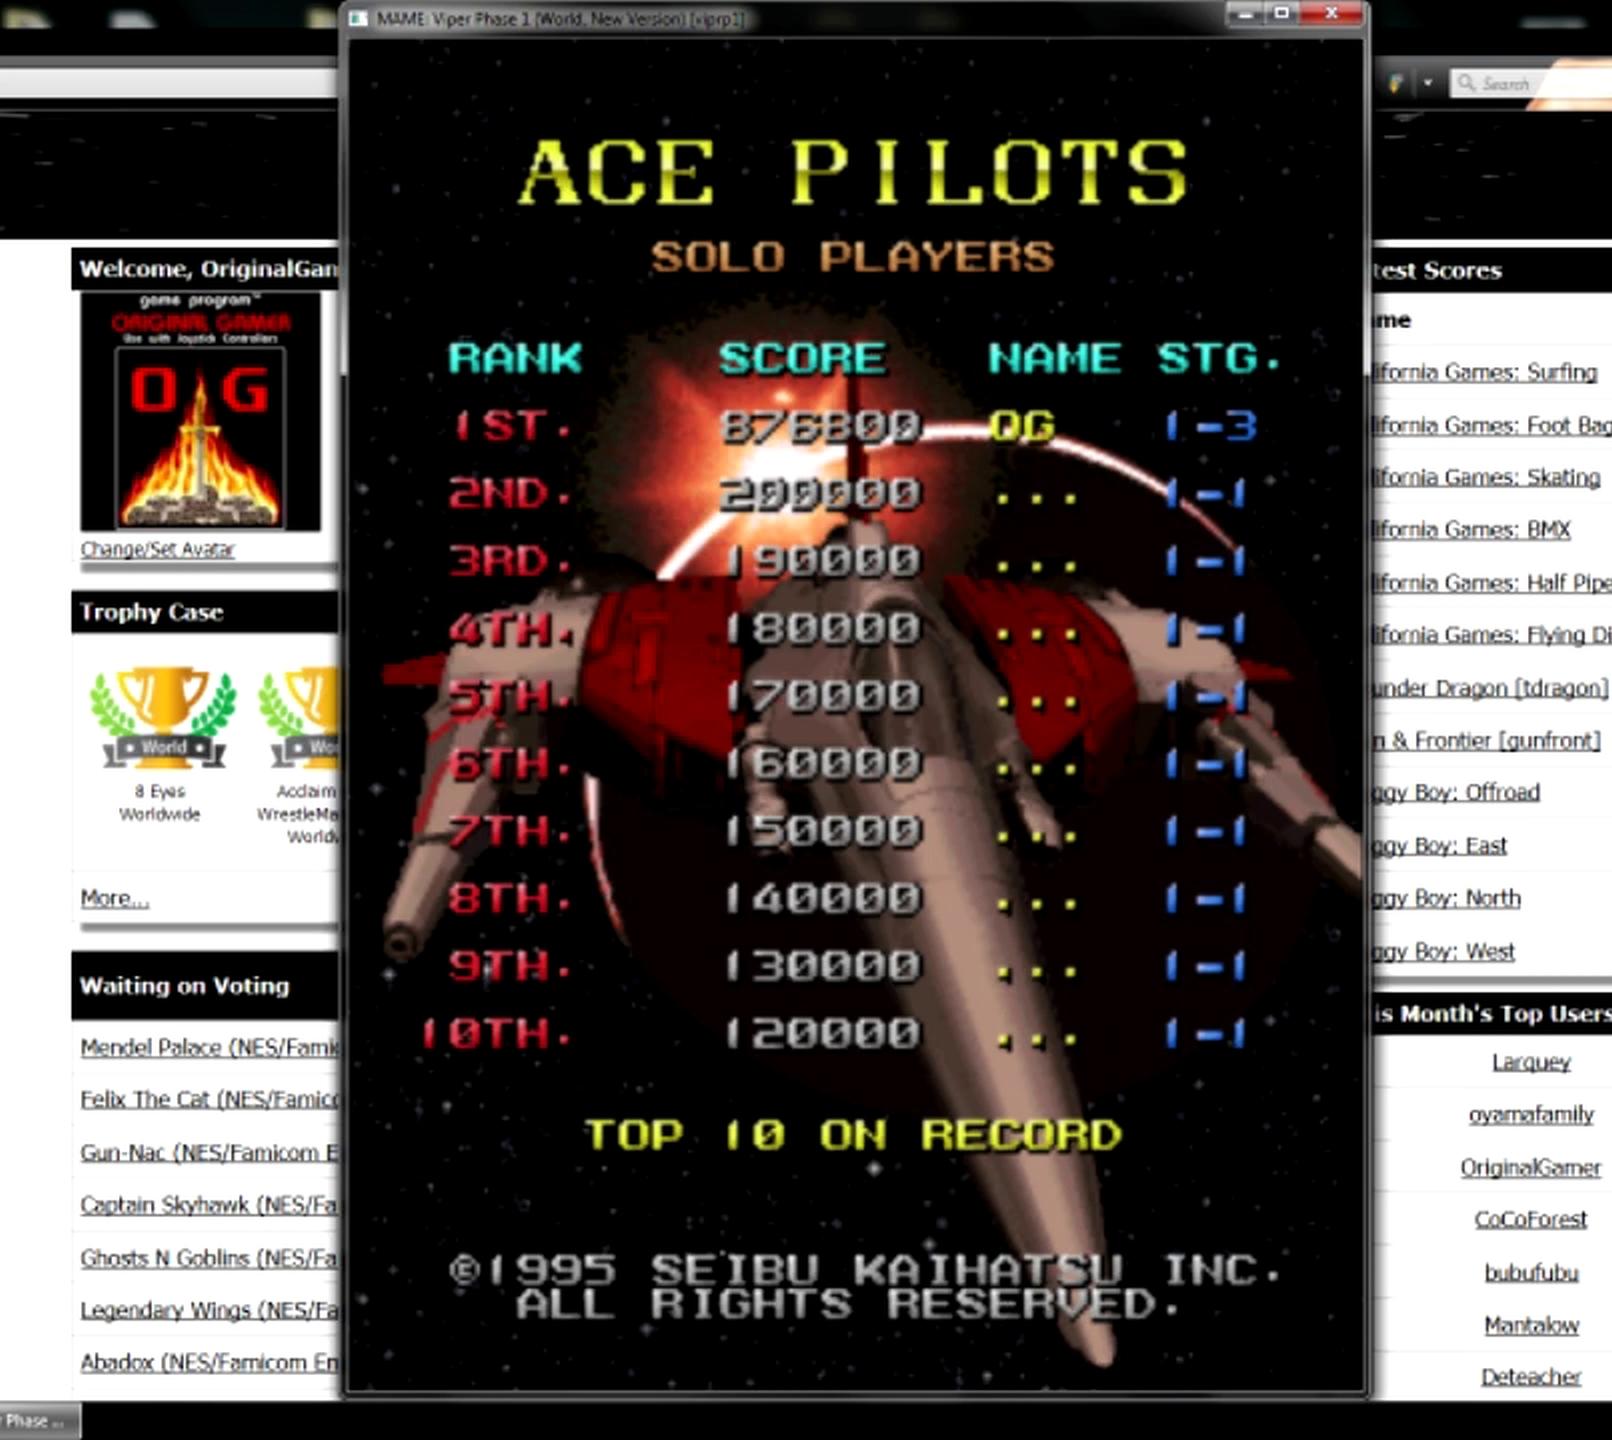 OriginalGamer: Viper Phase 1 New Version [viprp1] (Arcade Emulated / M.A.M.E.) 876,800 points on 2015-05-30 23:56:40